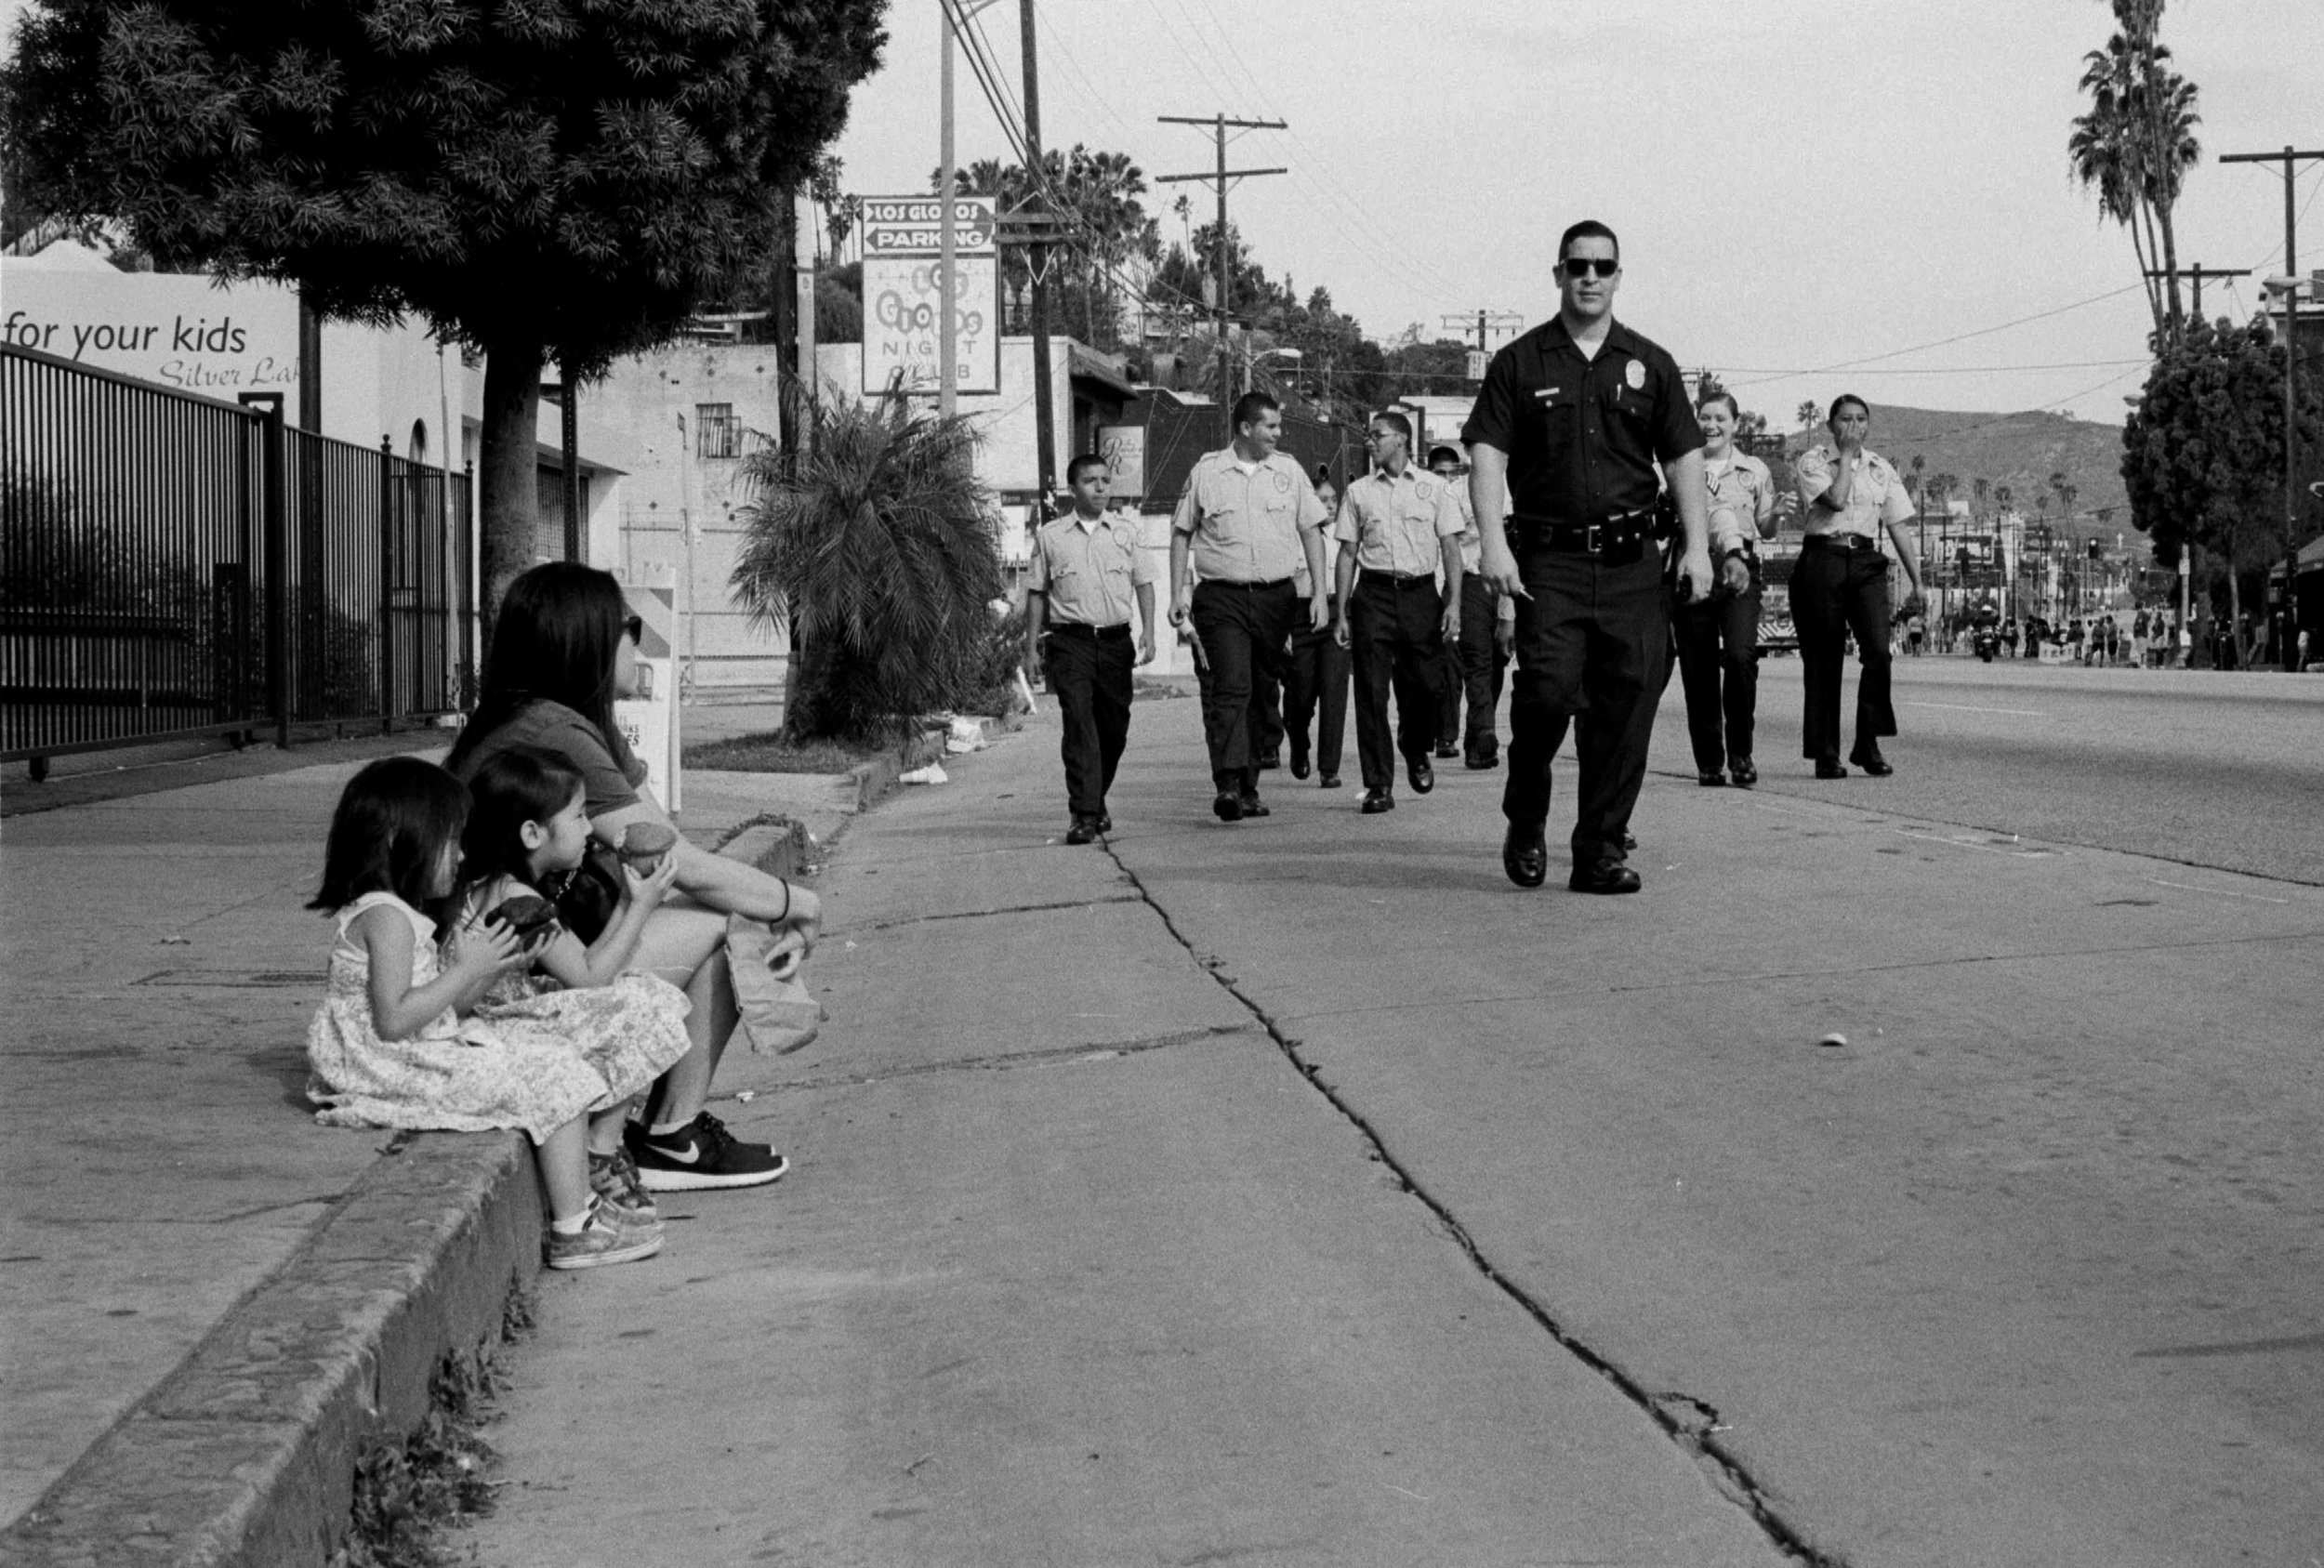 Street Scene | Los angeles, California 2015